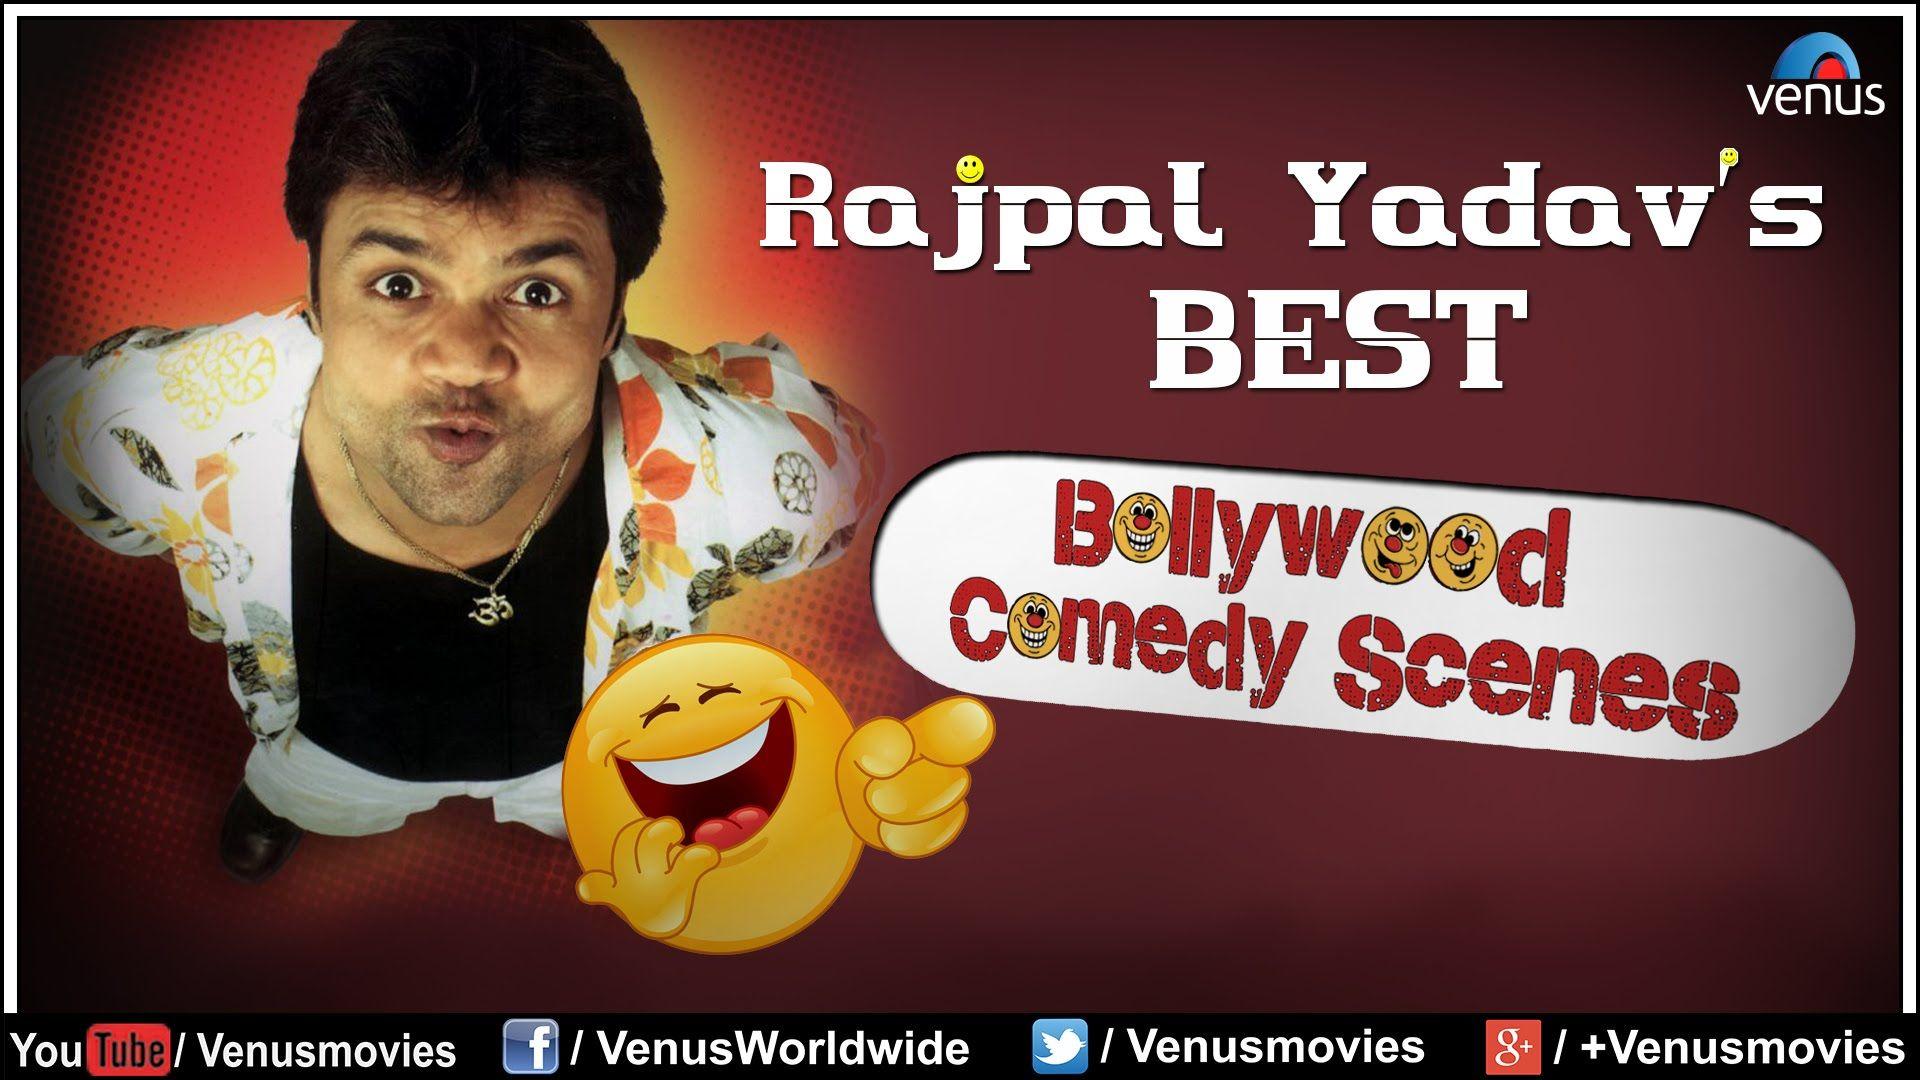 Bollywood Comedy Scenes of Rajpal Yadav